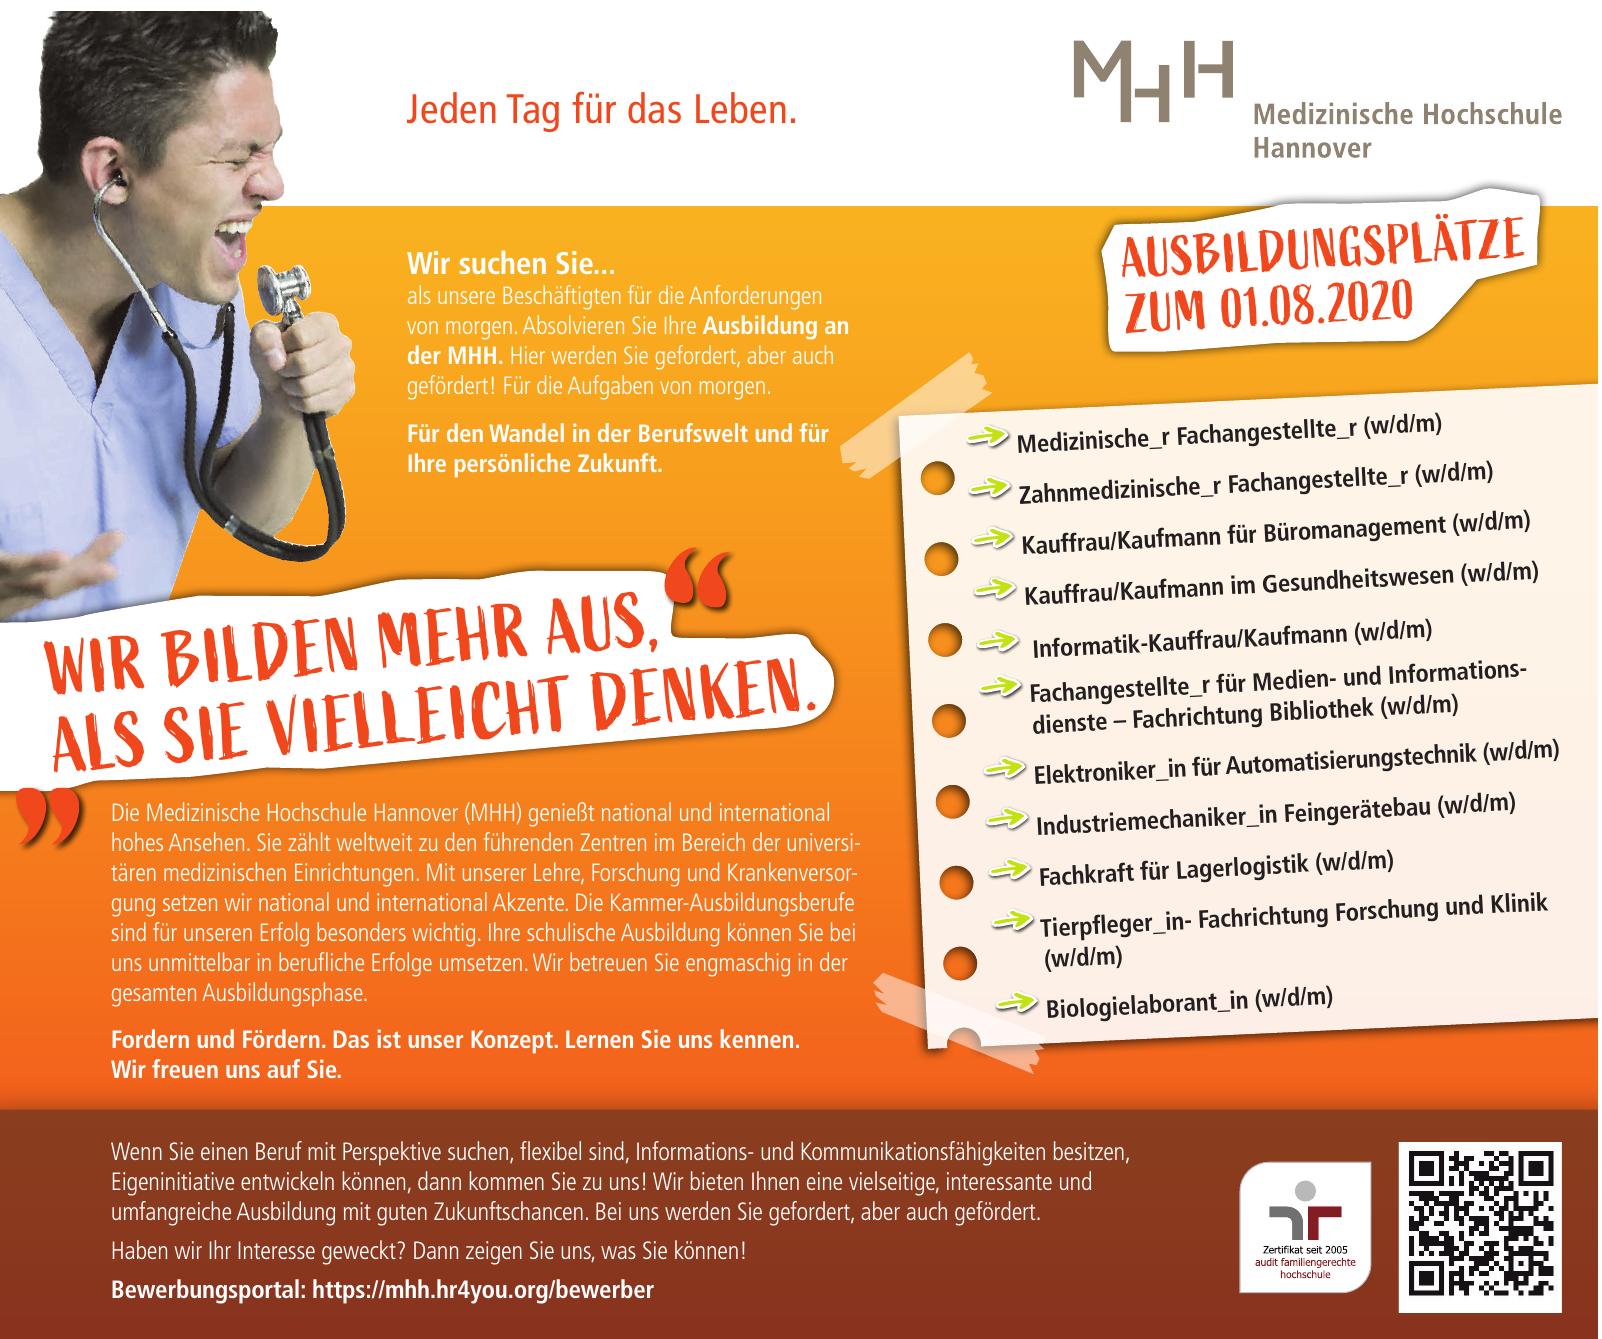 MHH Medizinische Hochschule Hannover